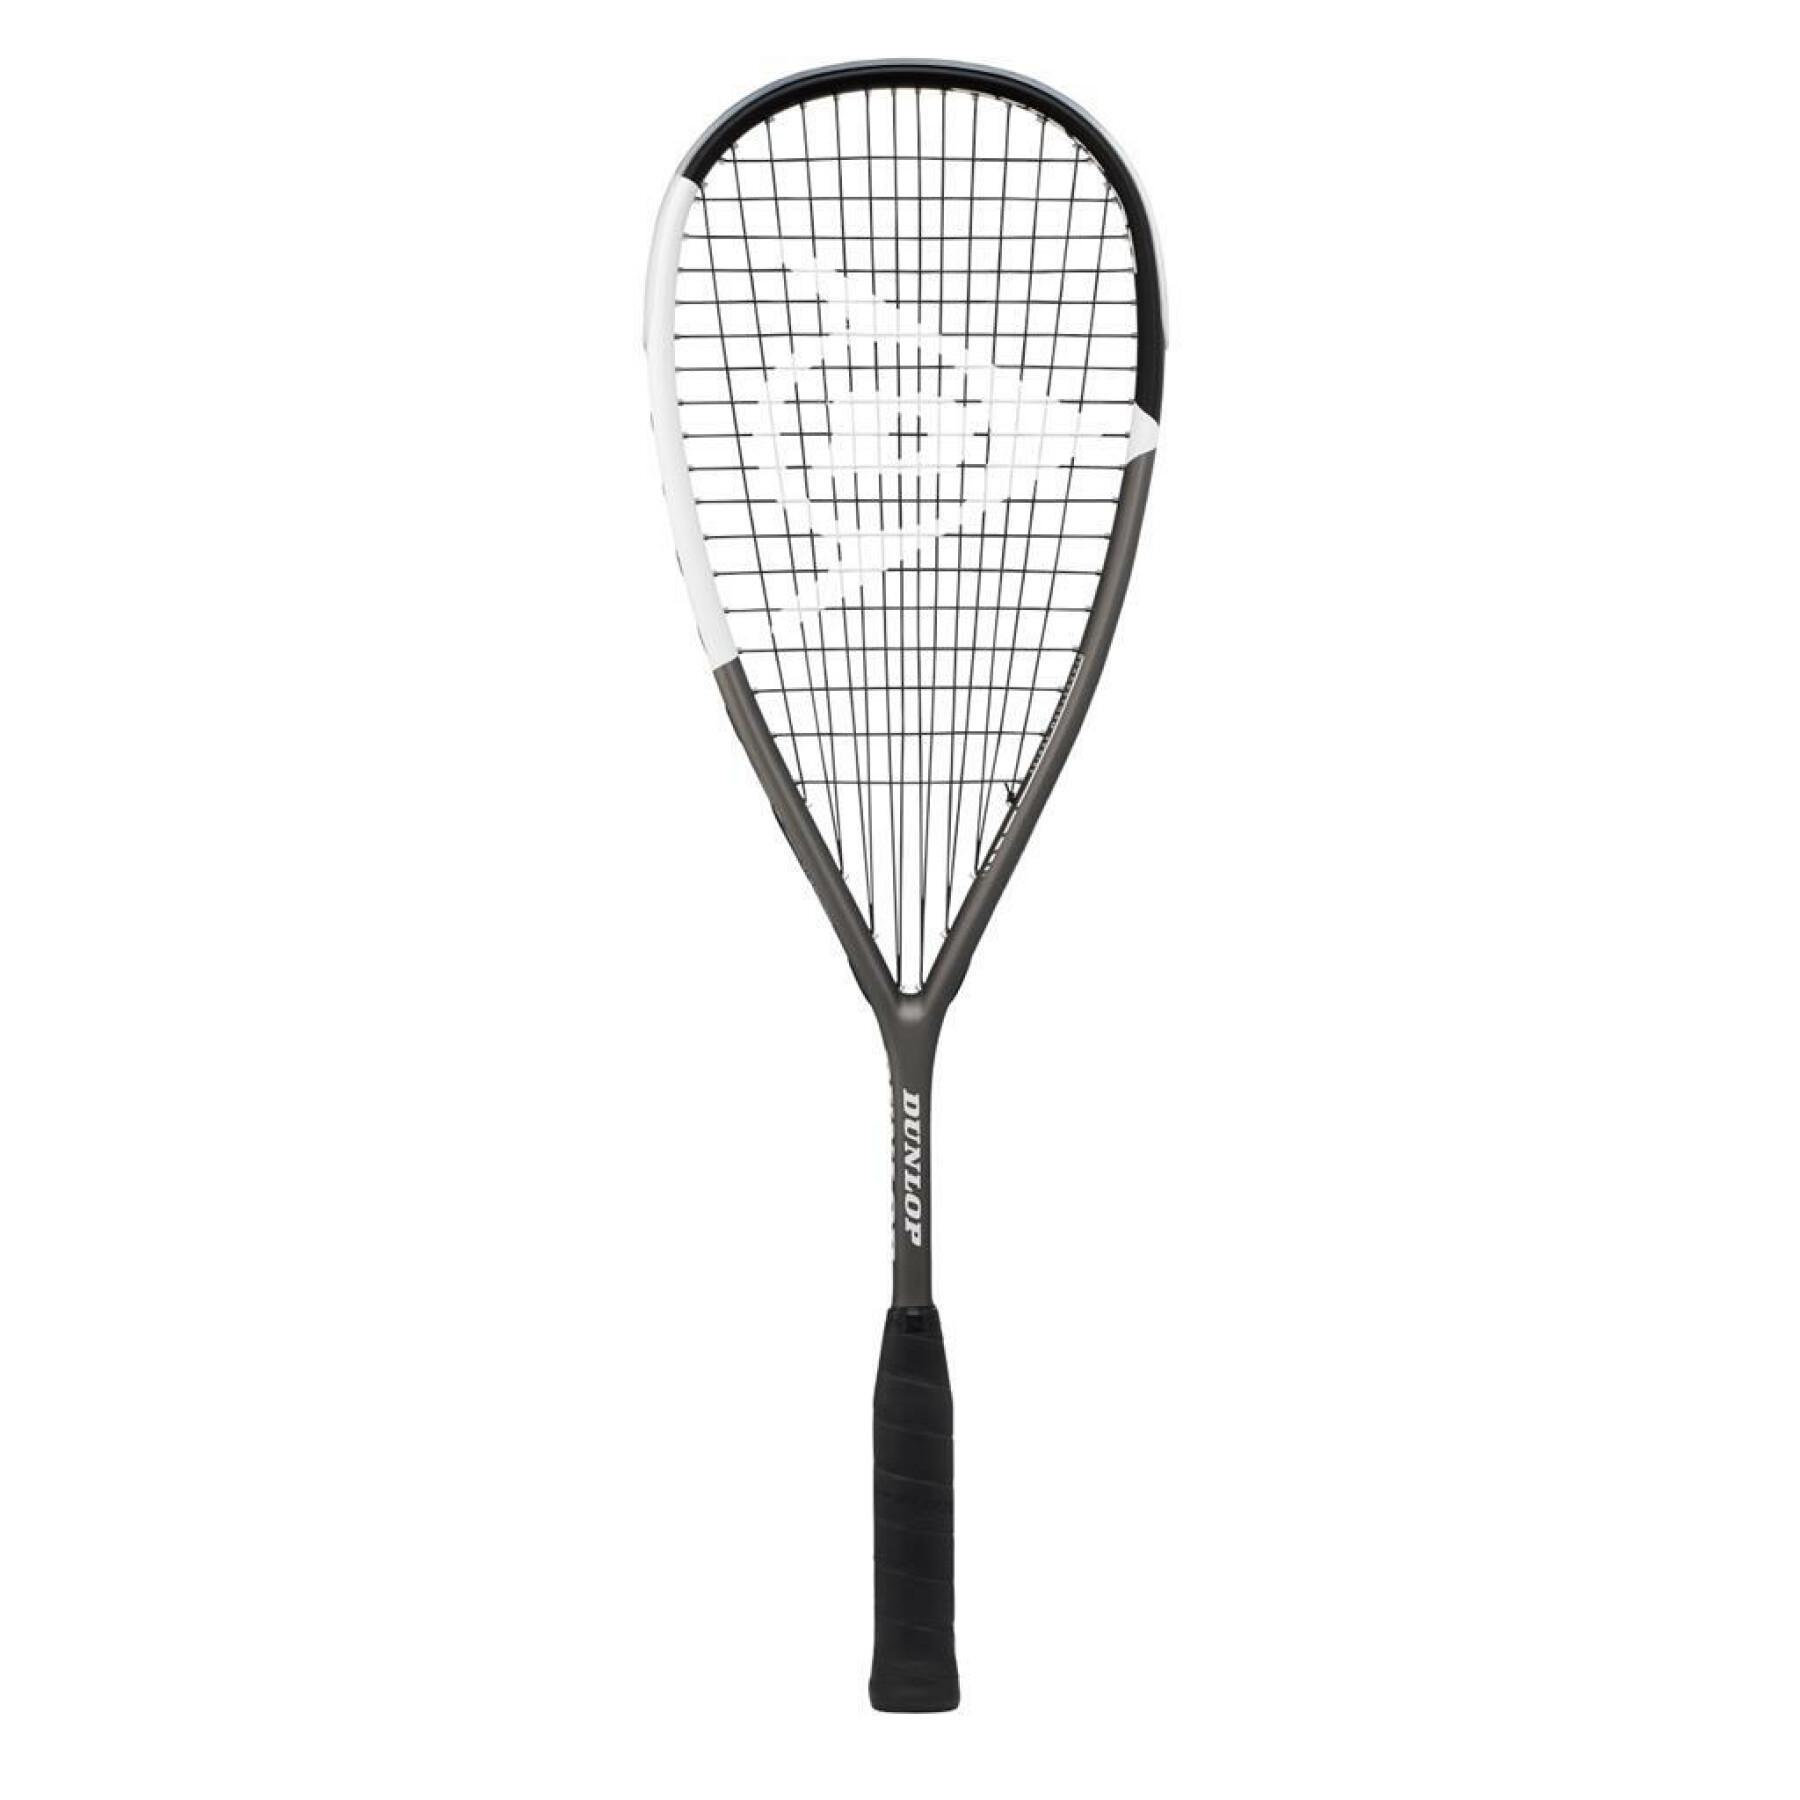 Racket Dunlop storm titanium 4.0